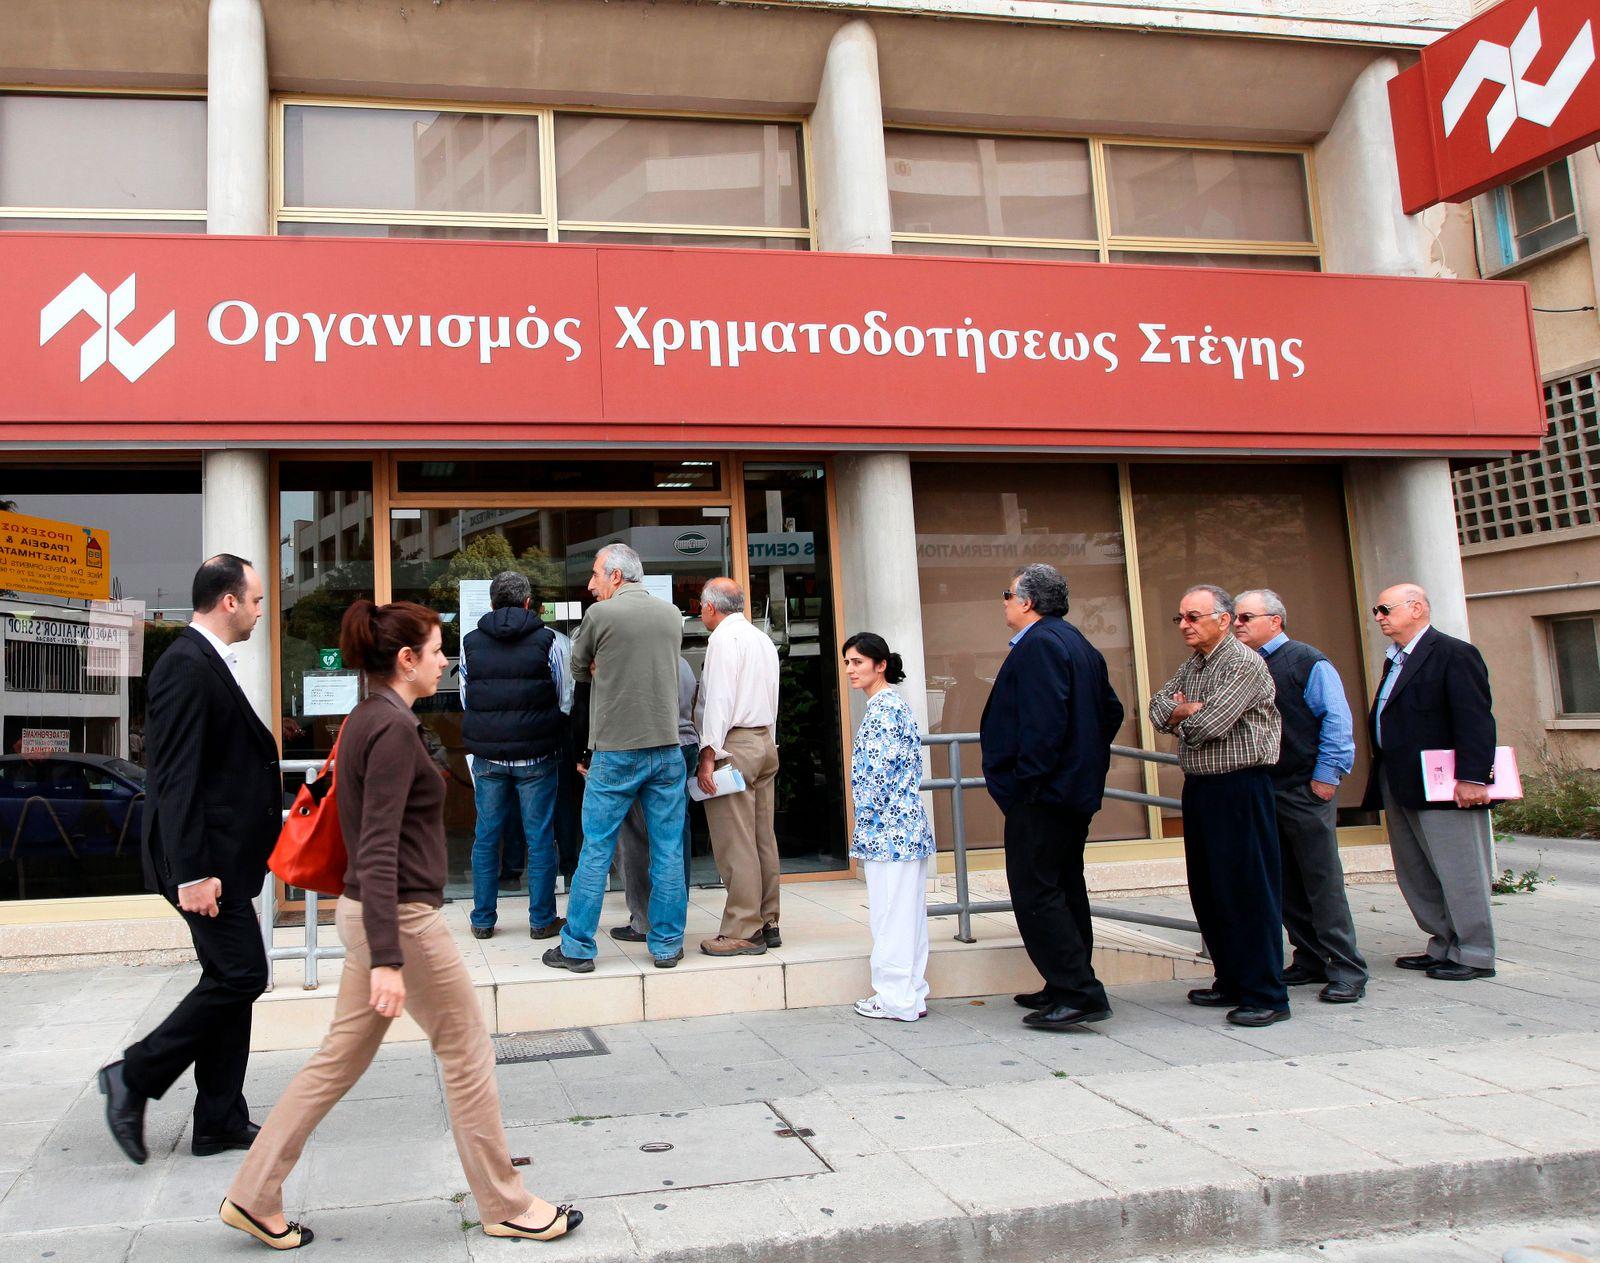 Zypern / Finanzkrise / Bank